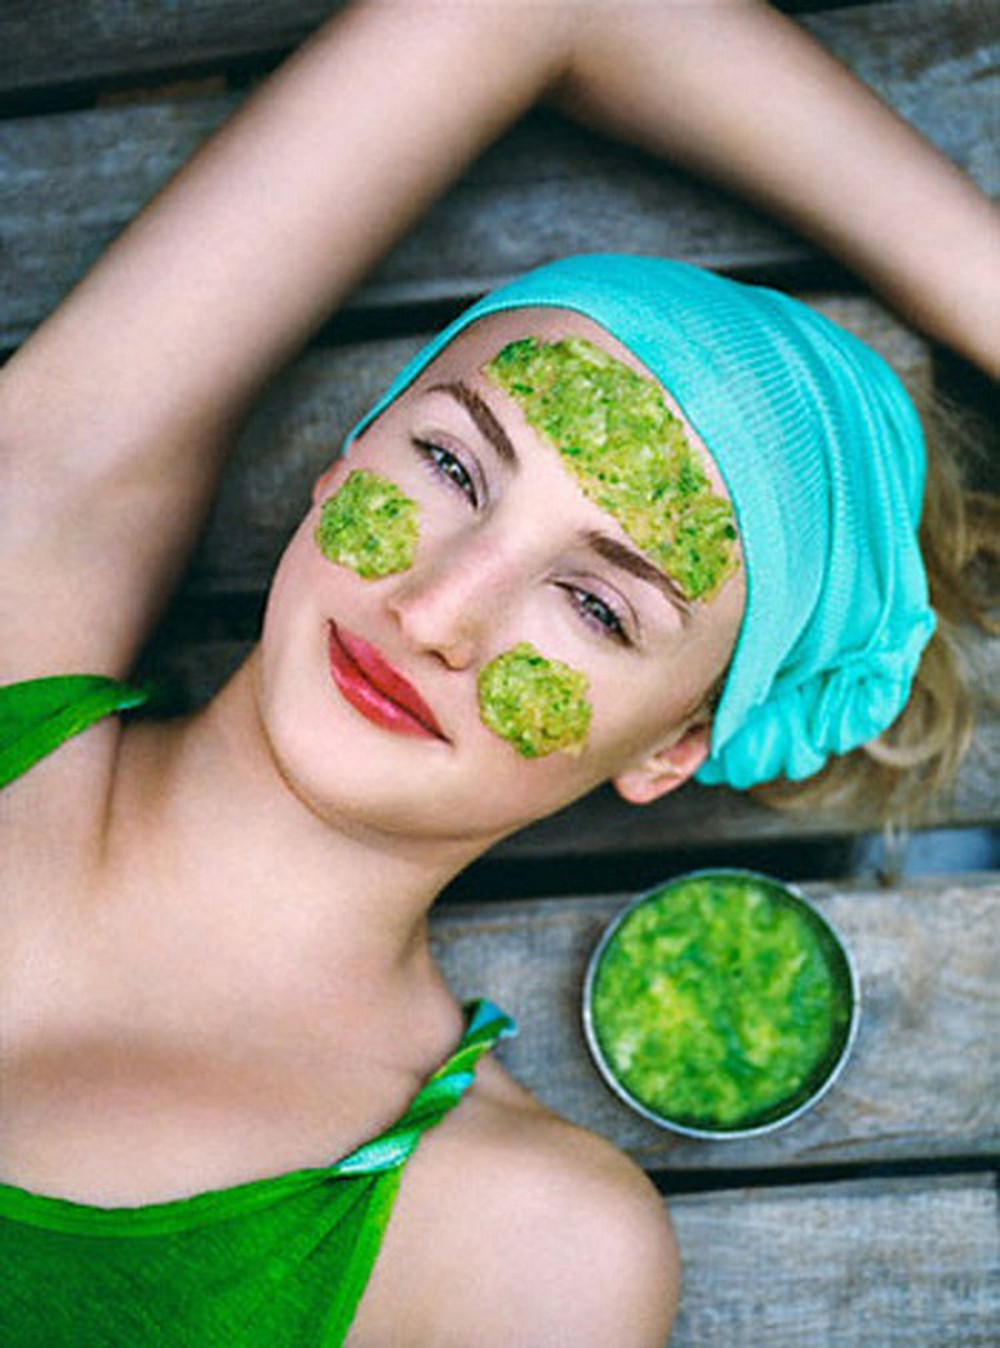 PunjabKesari, Wrinkles home remedies Image, Wrinkles Image